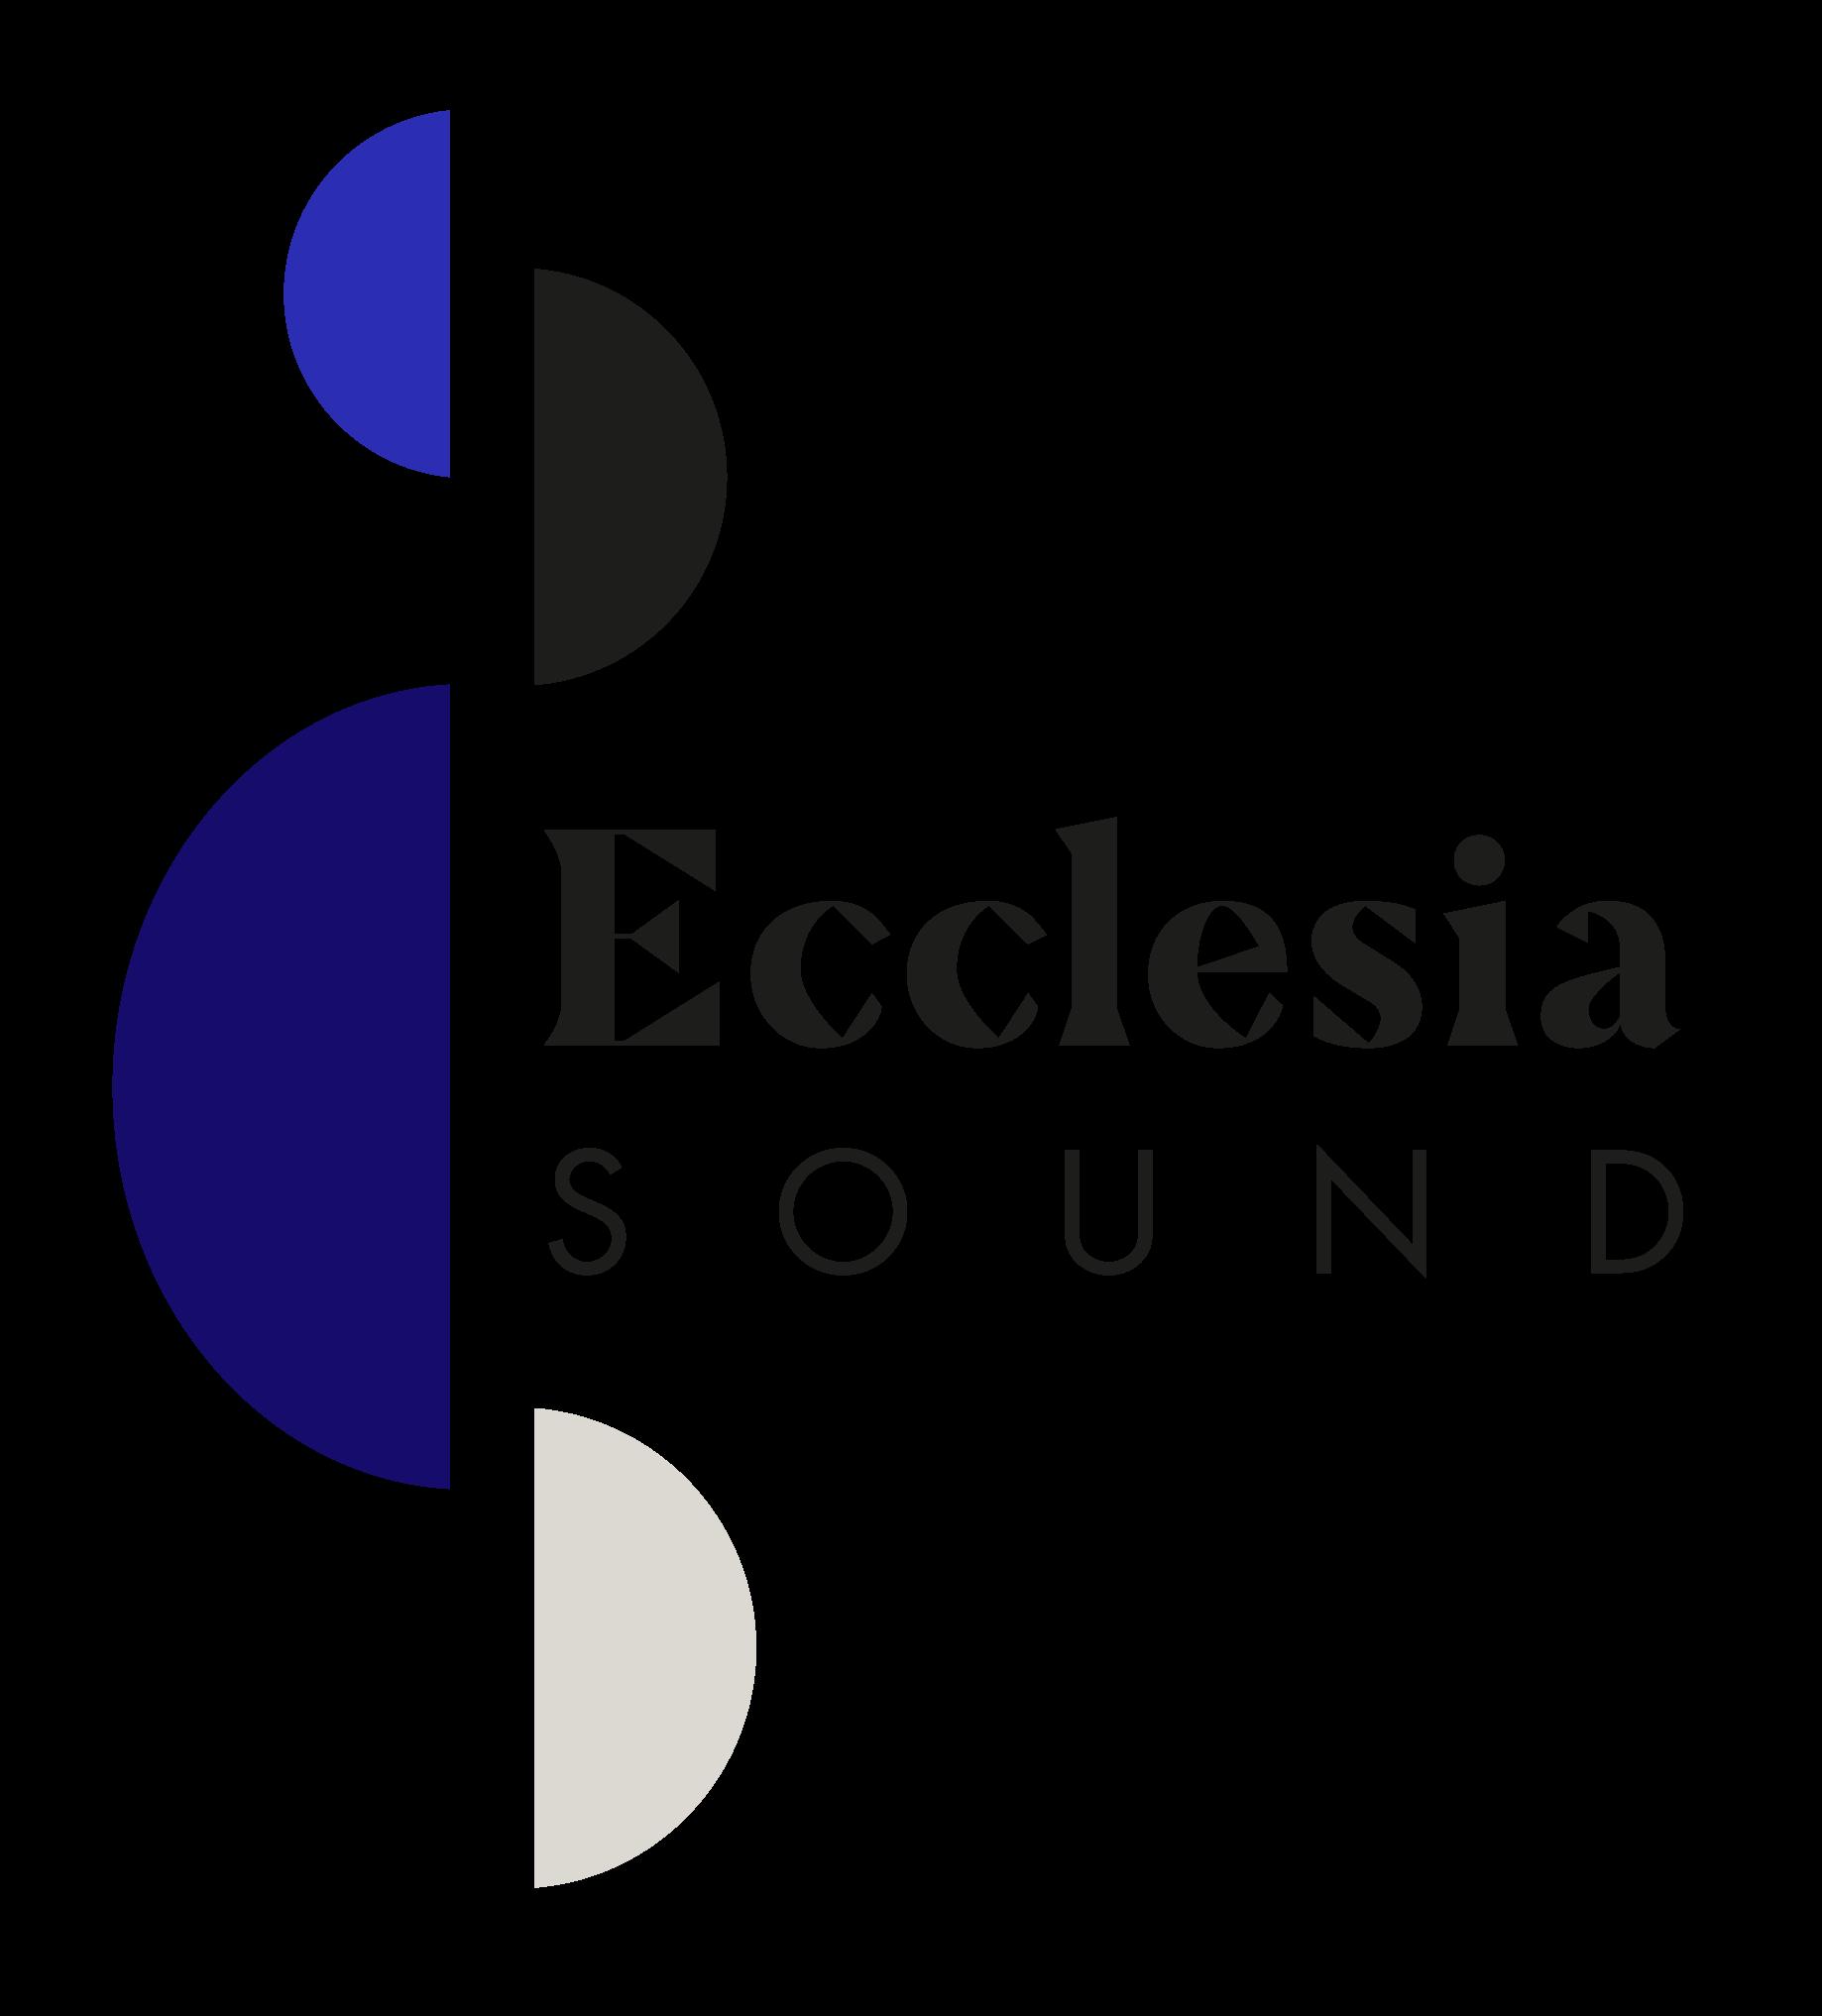 Ecclesia Sound